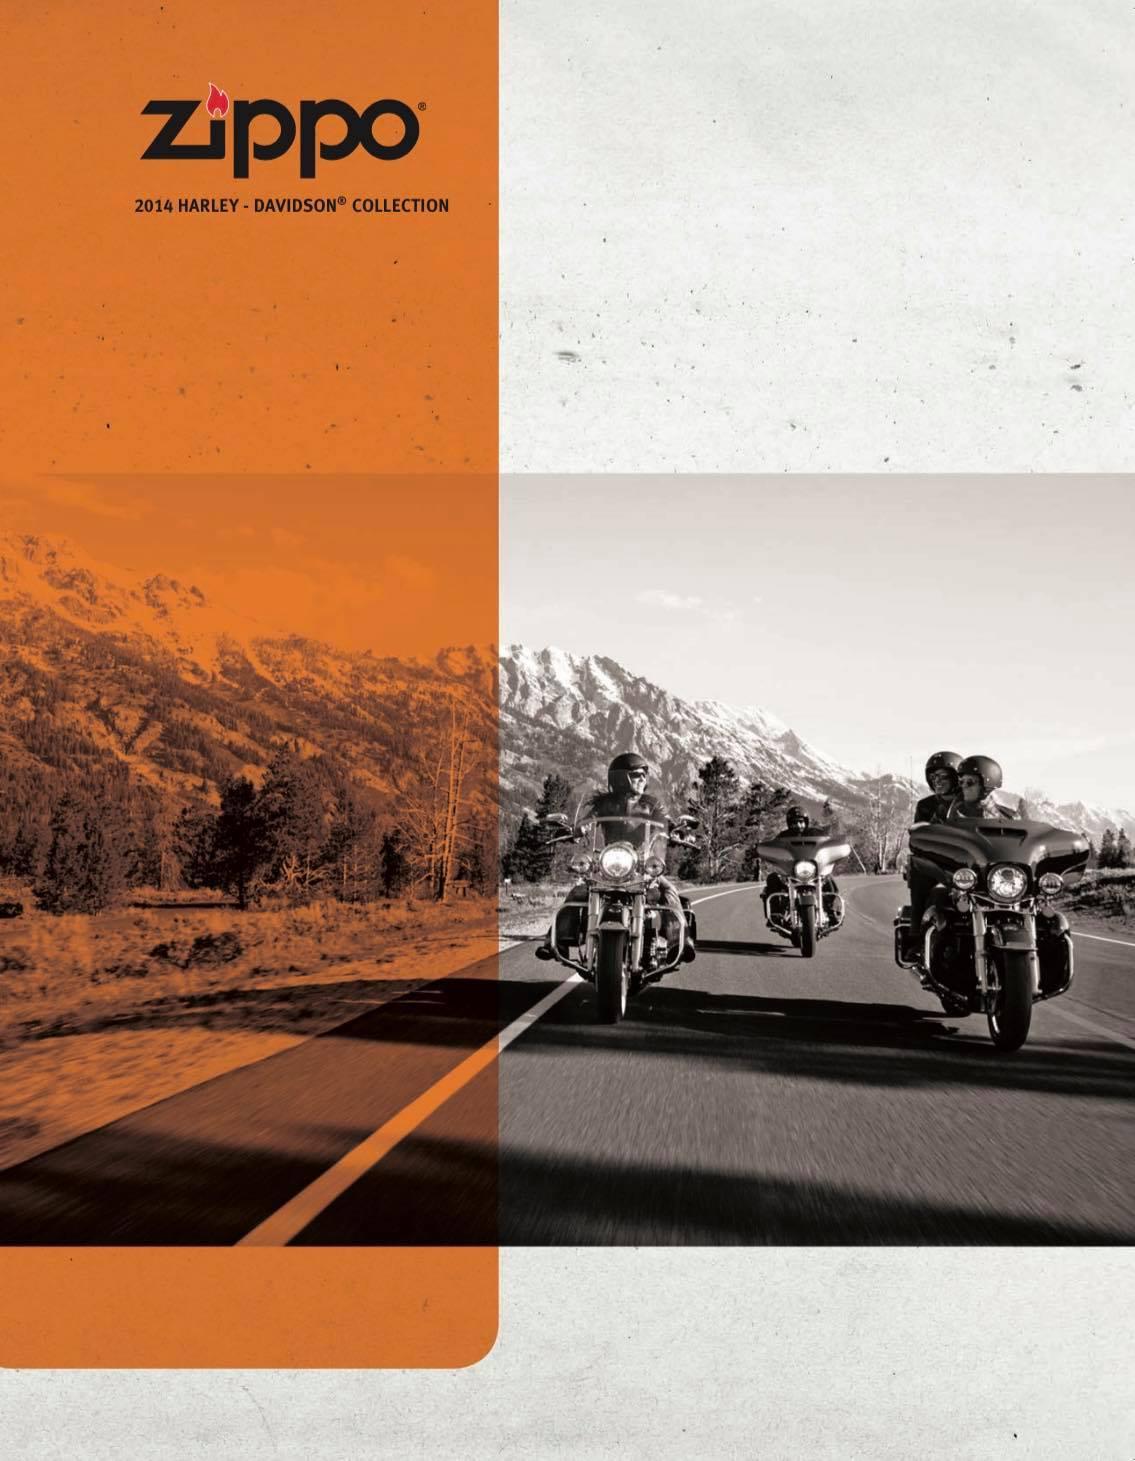 Zippo 2014 Harley Davidson Collection US